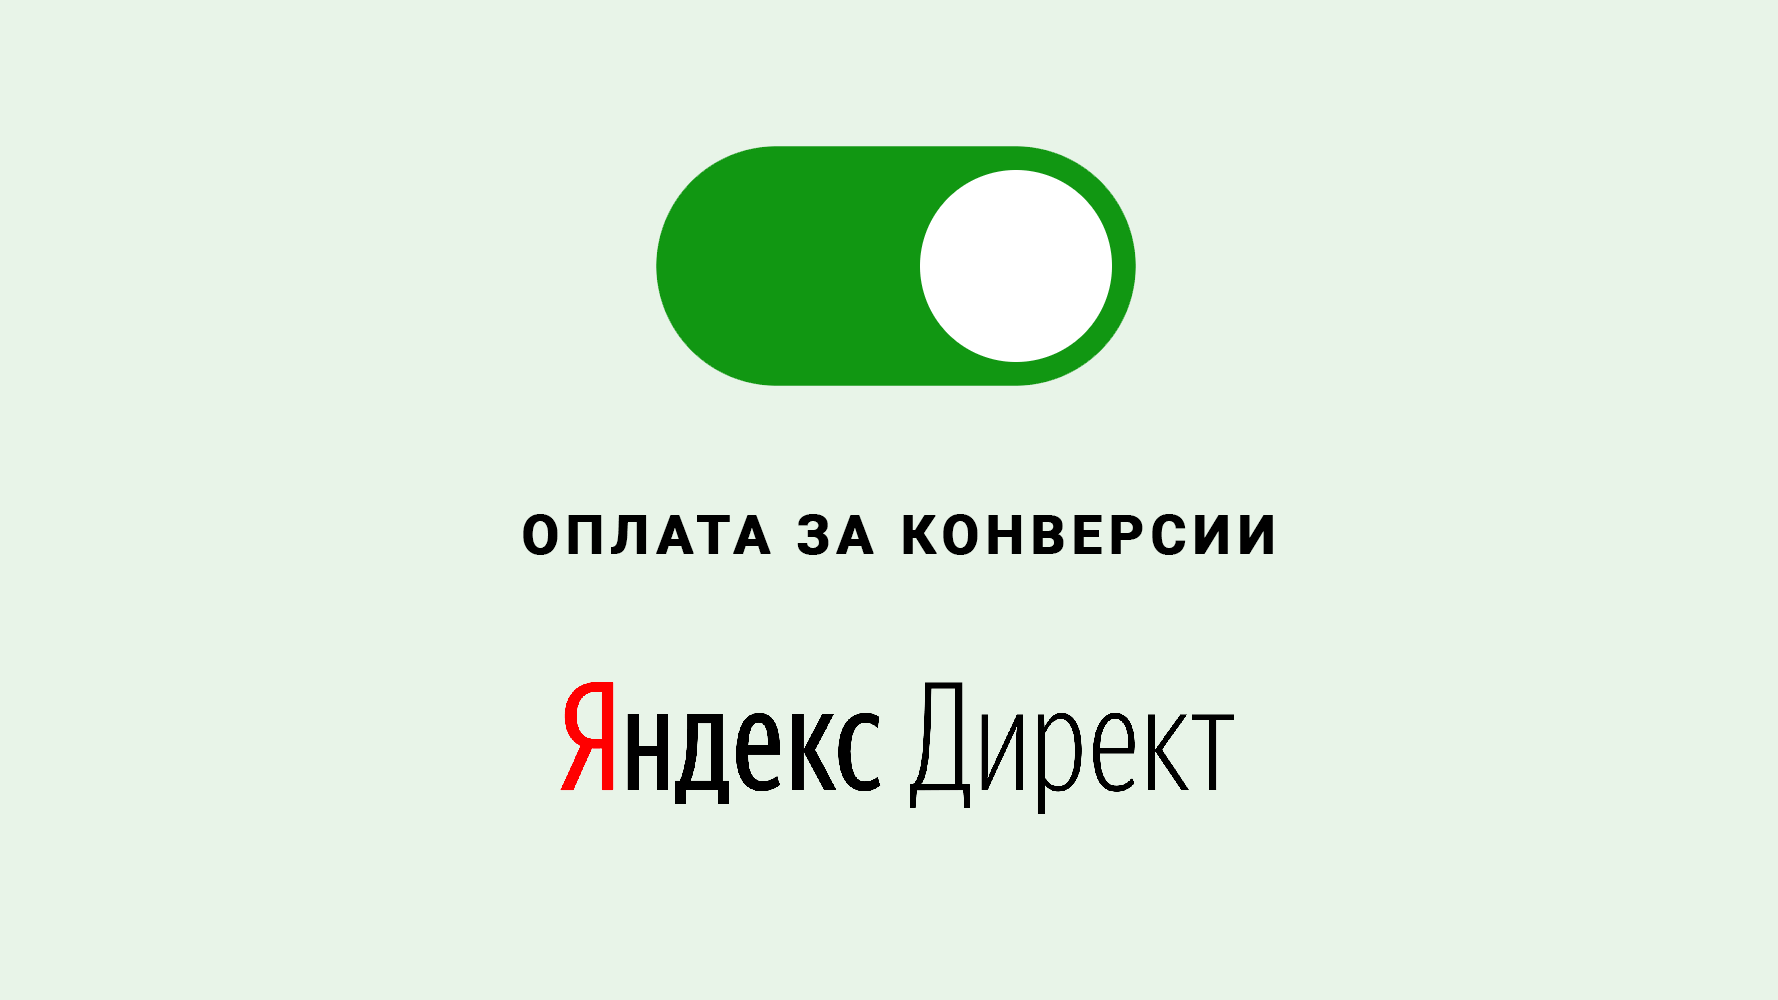 Яндекс Директ – оплата за конверсии, новая стратегия